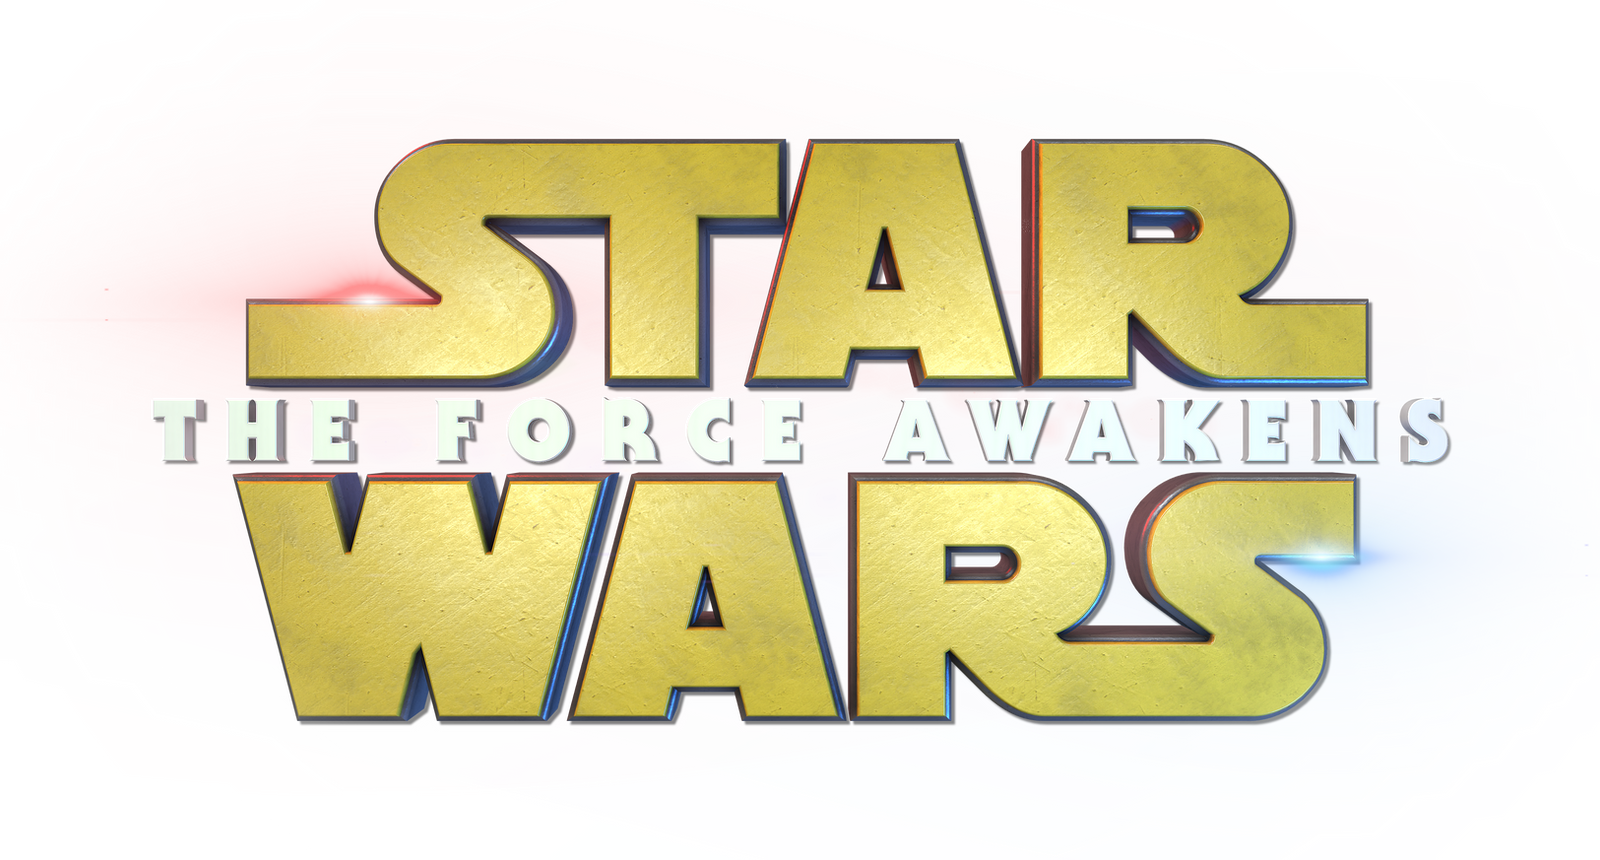 Star Wars : The Force Awakens - Title Logo 3D 4K